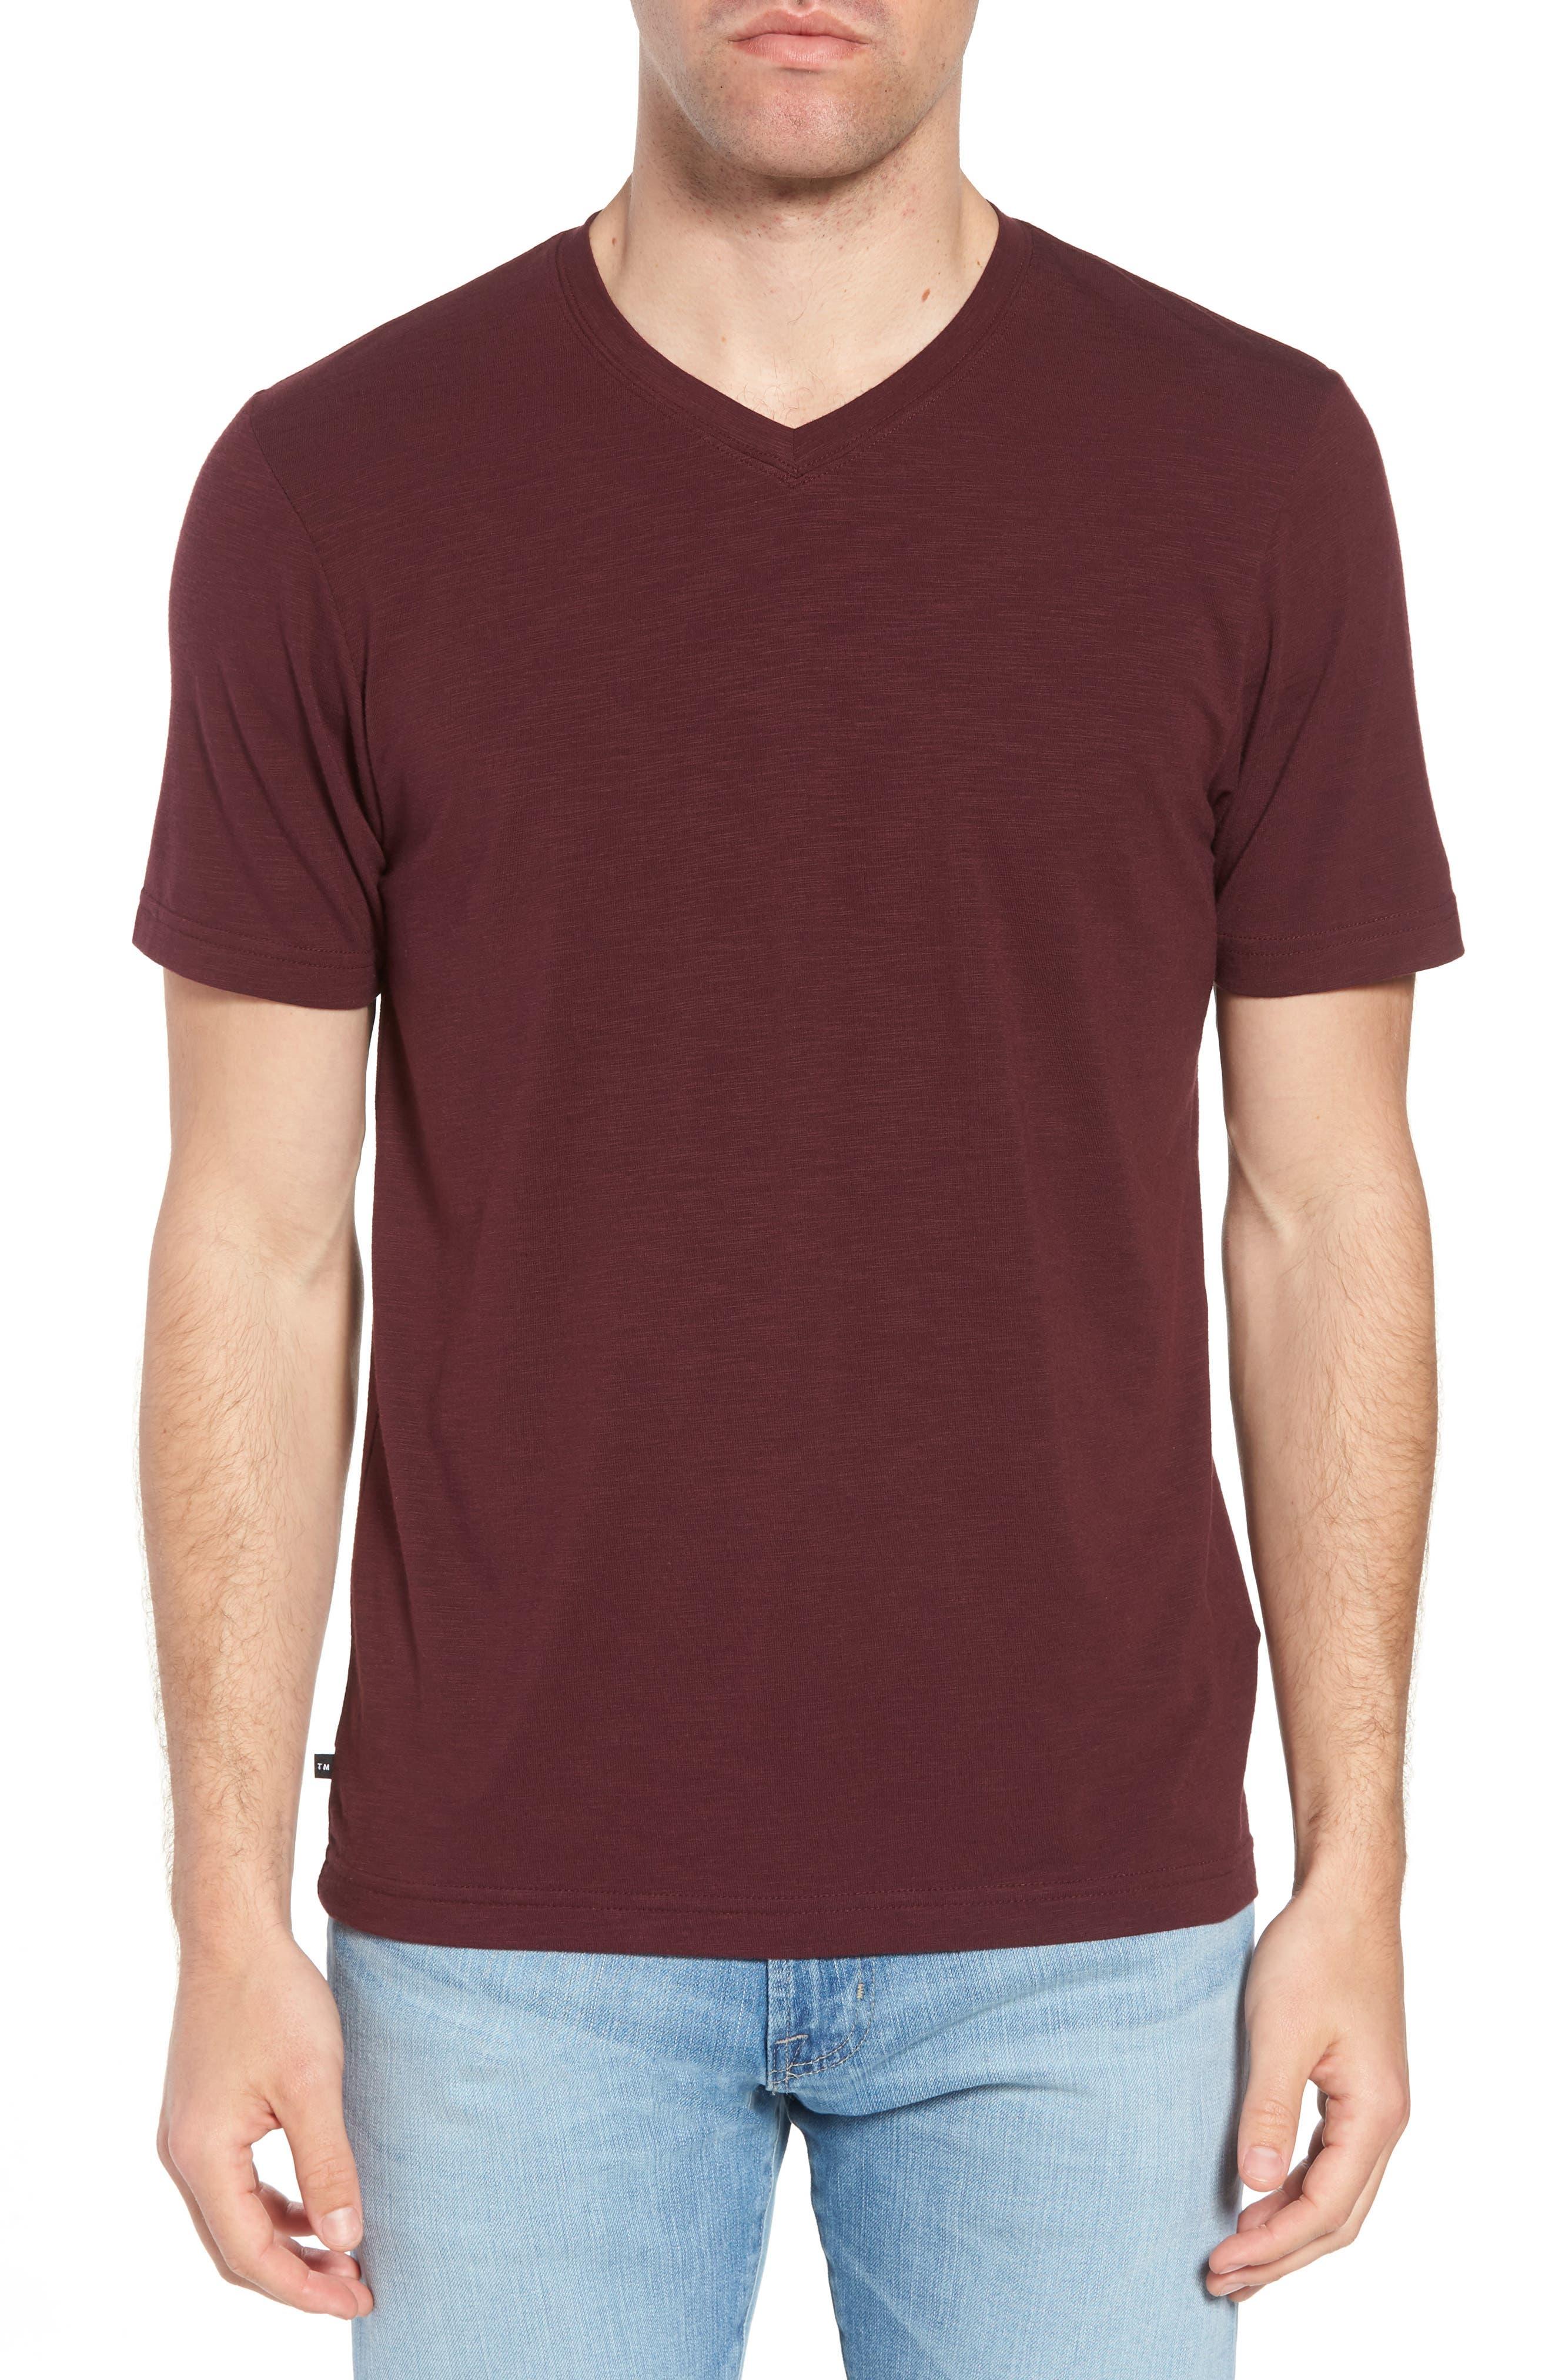 Alternate Image 1 Selected - Travis Mathew 'Trumbull' Trim Fit Slubbed T-Shirt